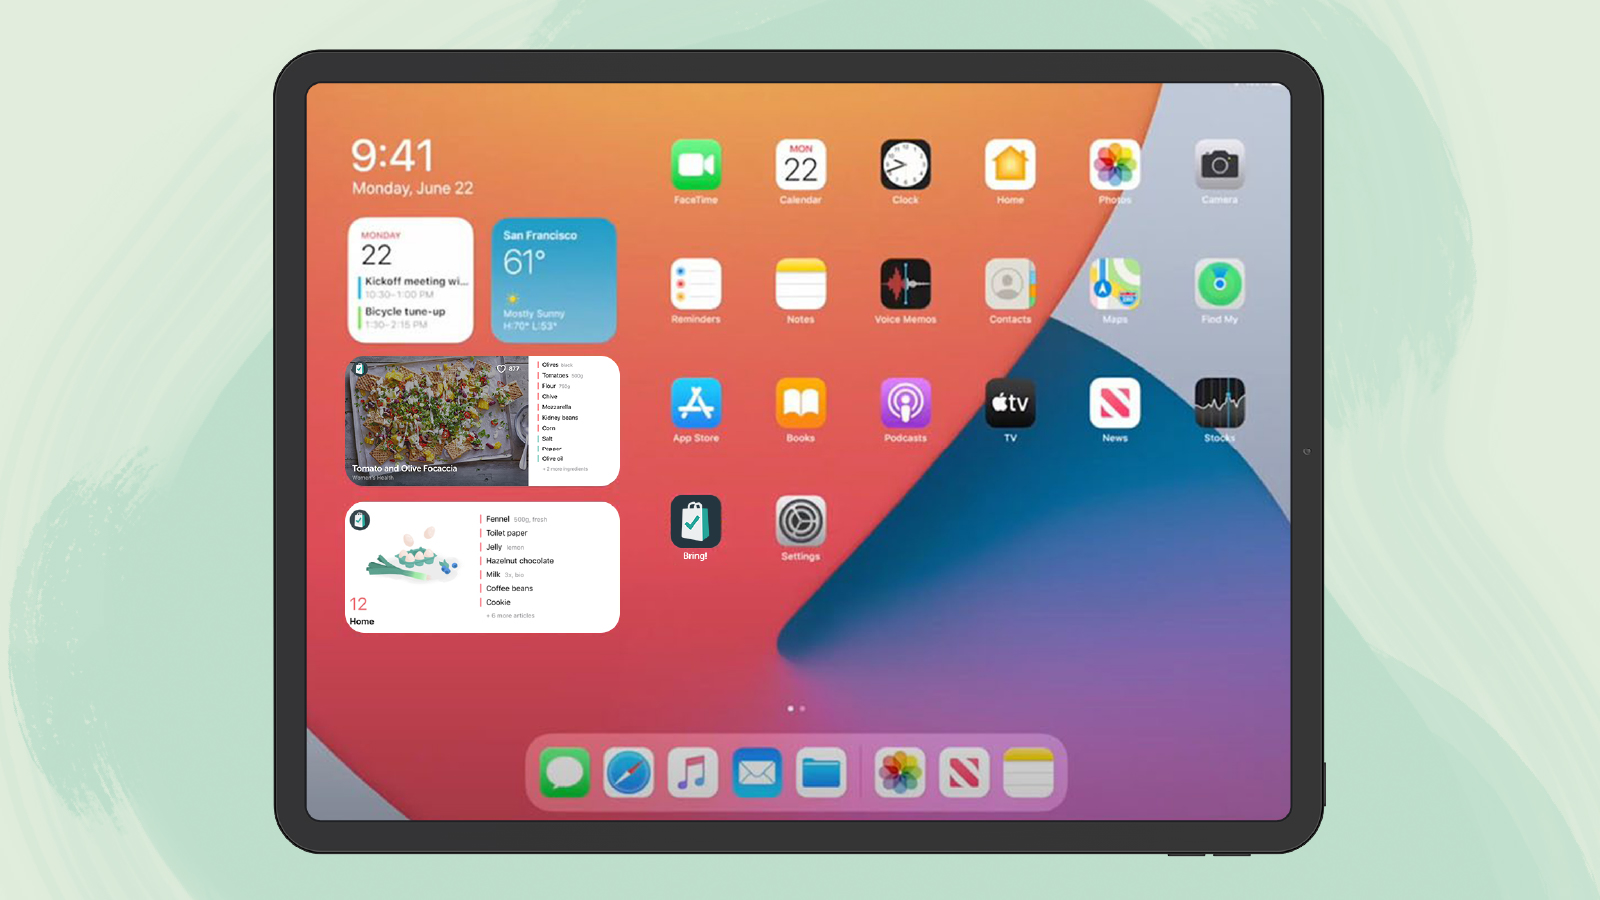 The XL Widgets on the iPad home screen